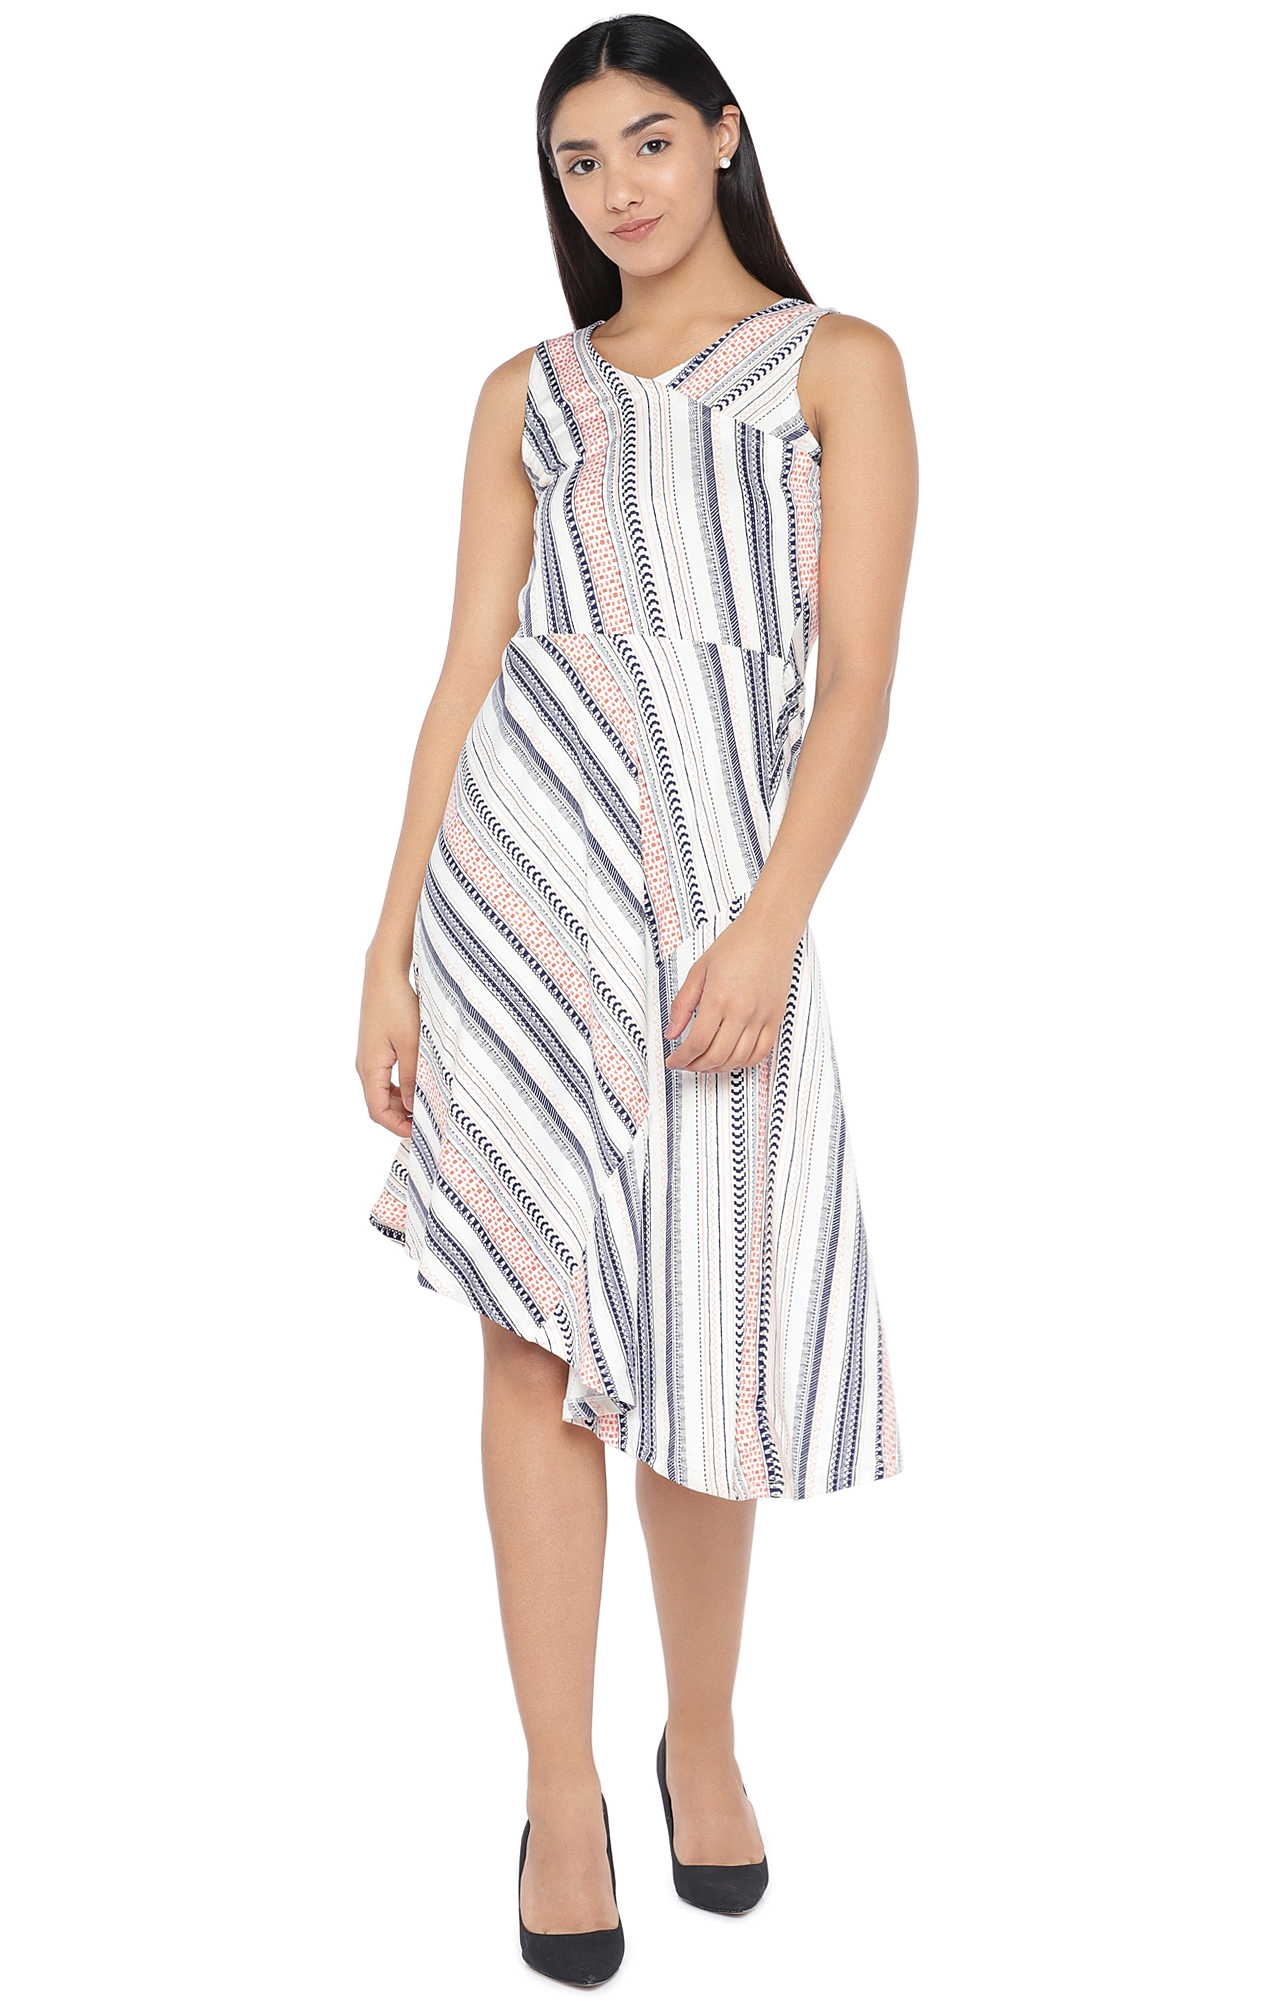 globus | Ivory Printed Asymmetric Dress